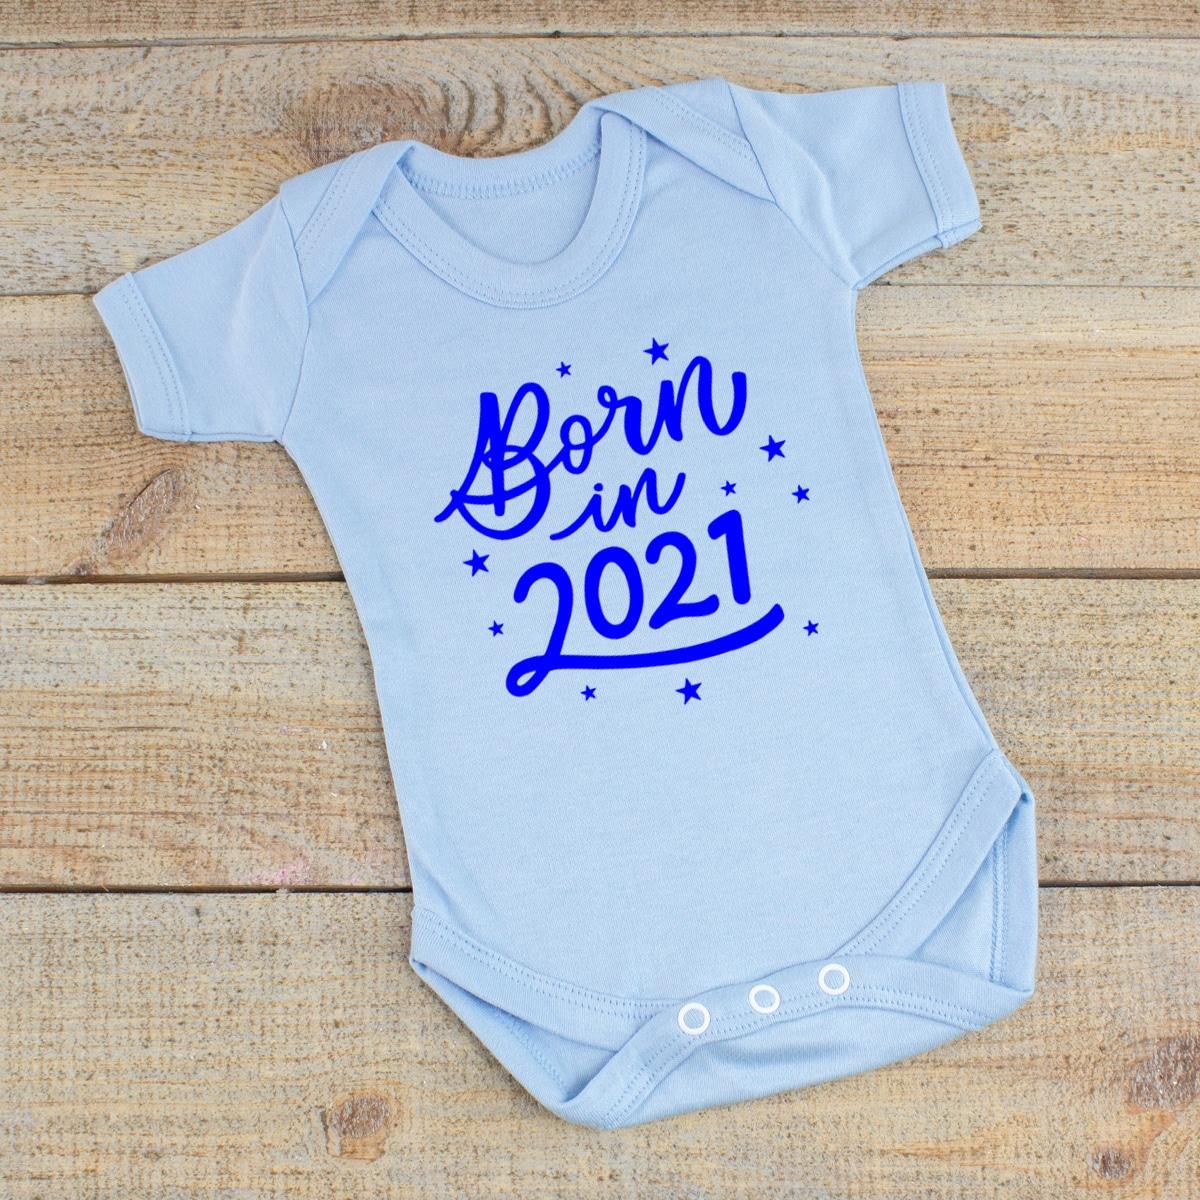 Baby Boy Born in 2021 Clothes